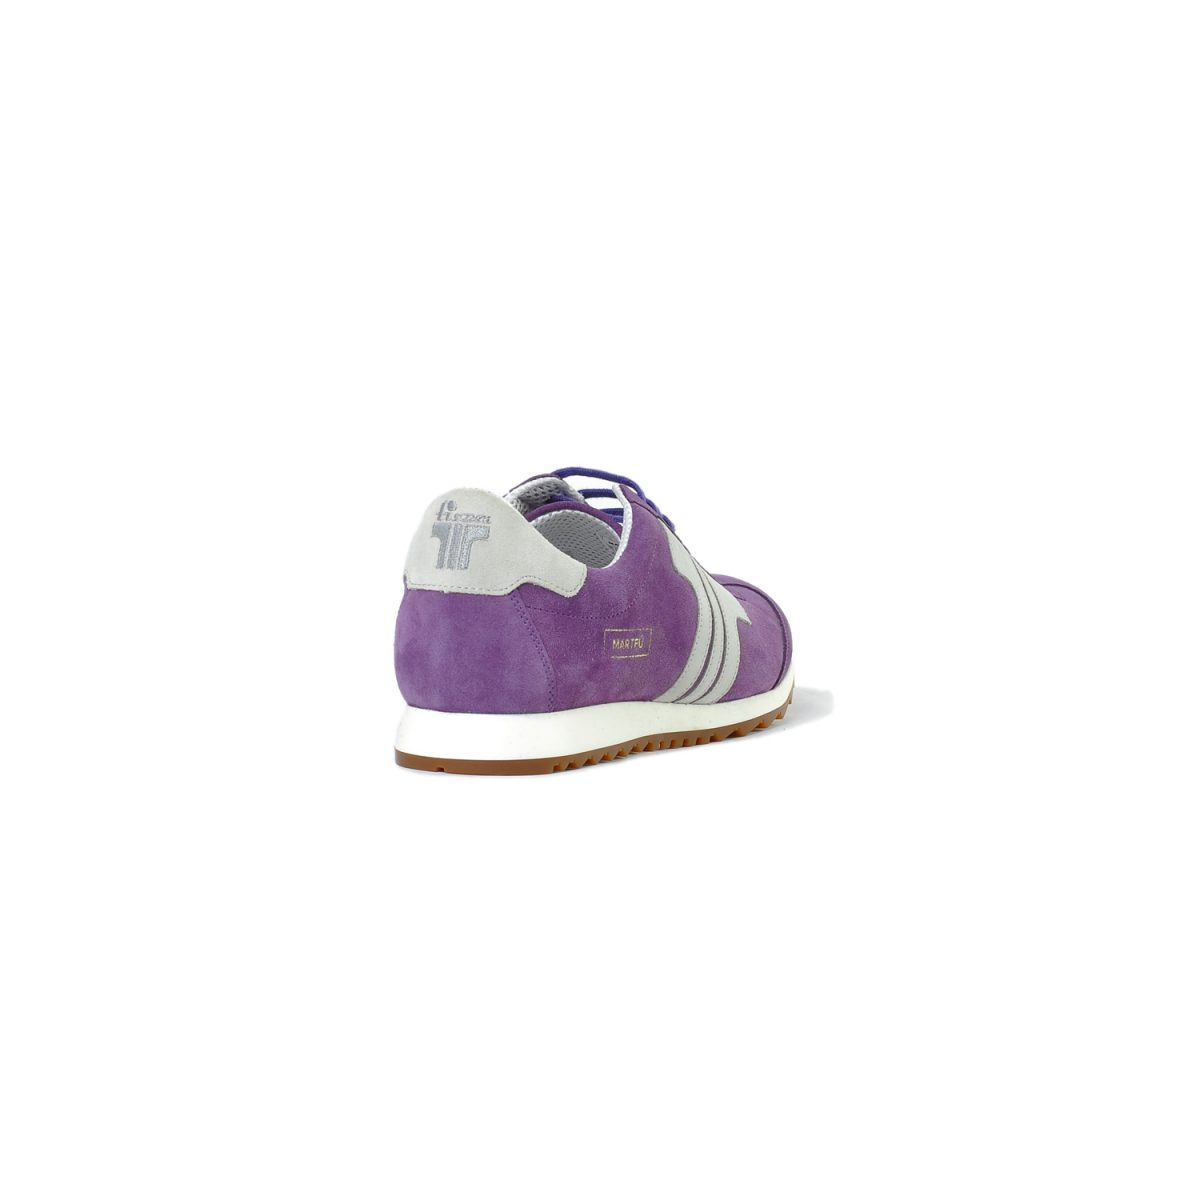 Tisza cipő - Martfű - Lila-natúr